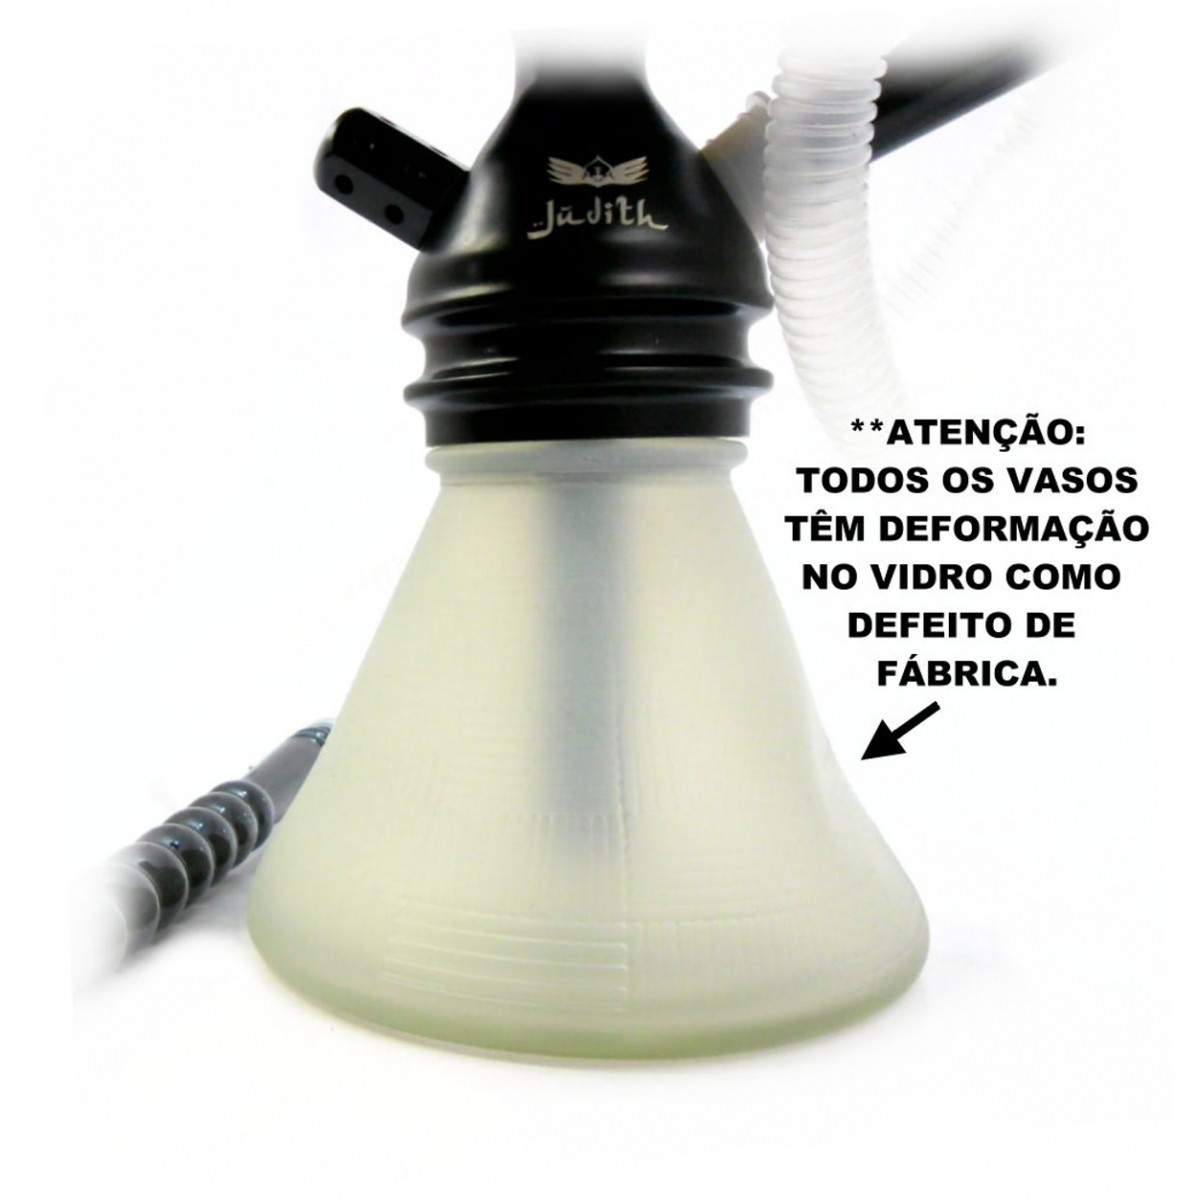 Narguile JUDITH POLIDO 33cm, vaso Petit BRANCO, mangueira MD HOSE PRETA, fornilho Flux Bowl, prato VENNUS PRETO/CROMADO